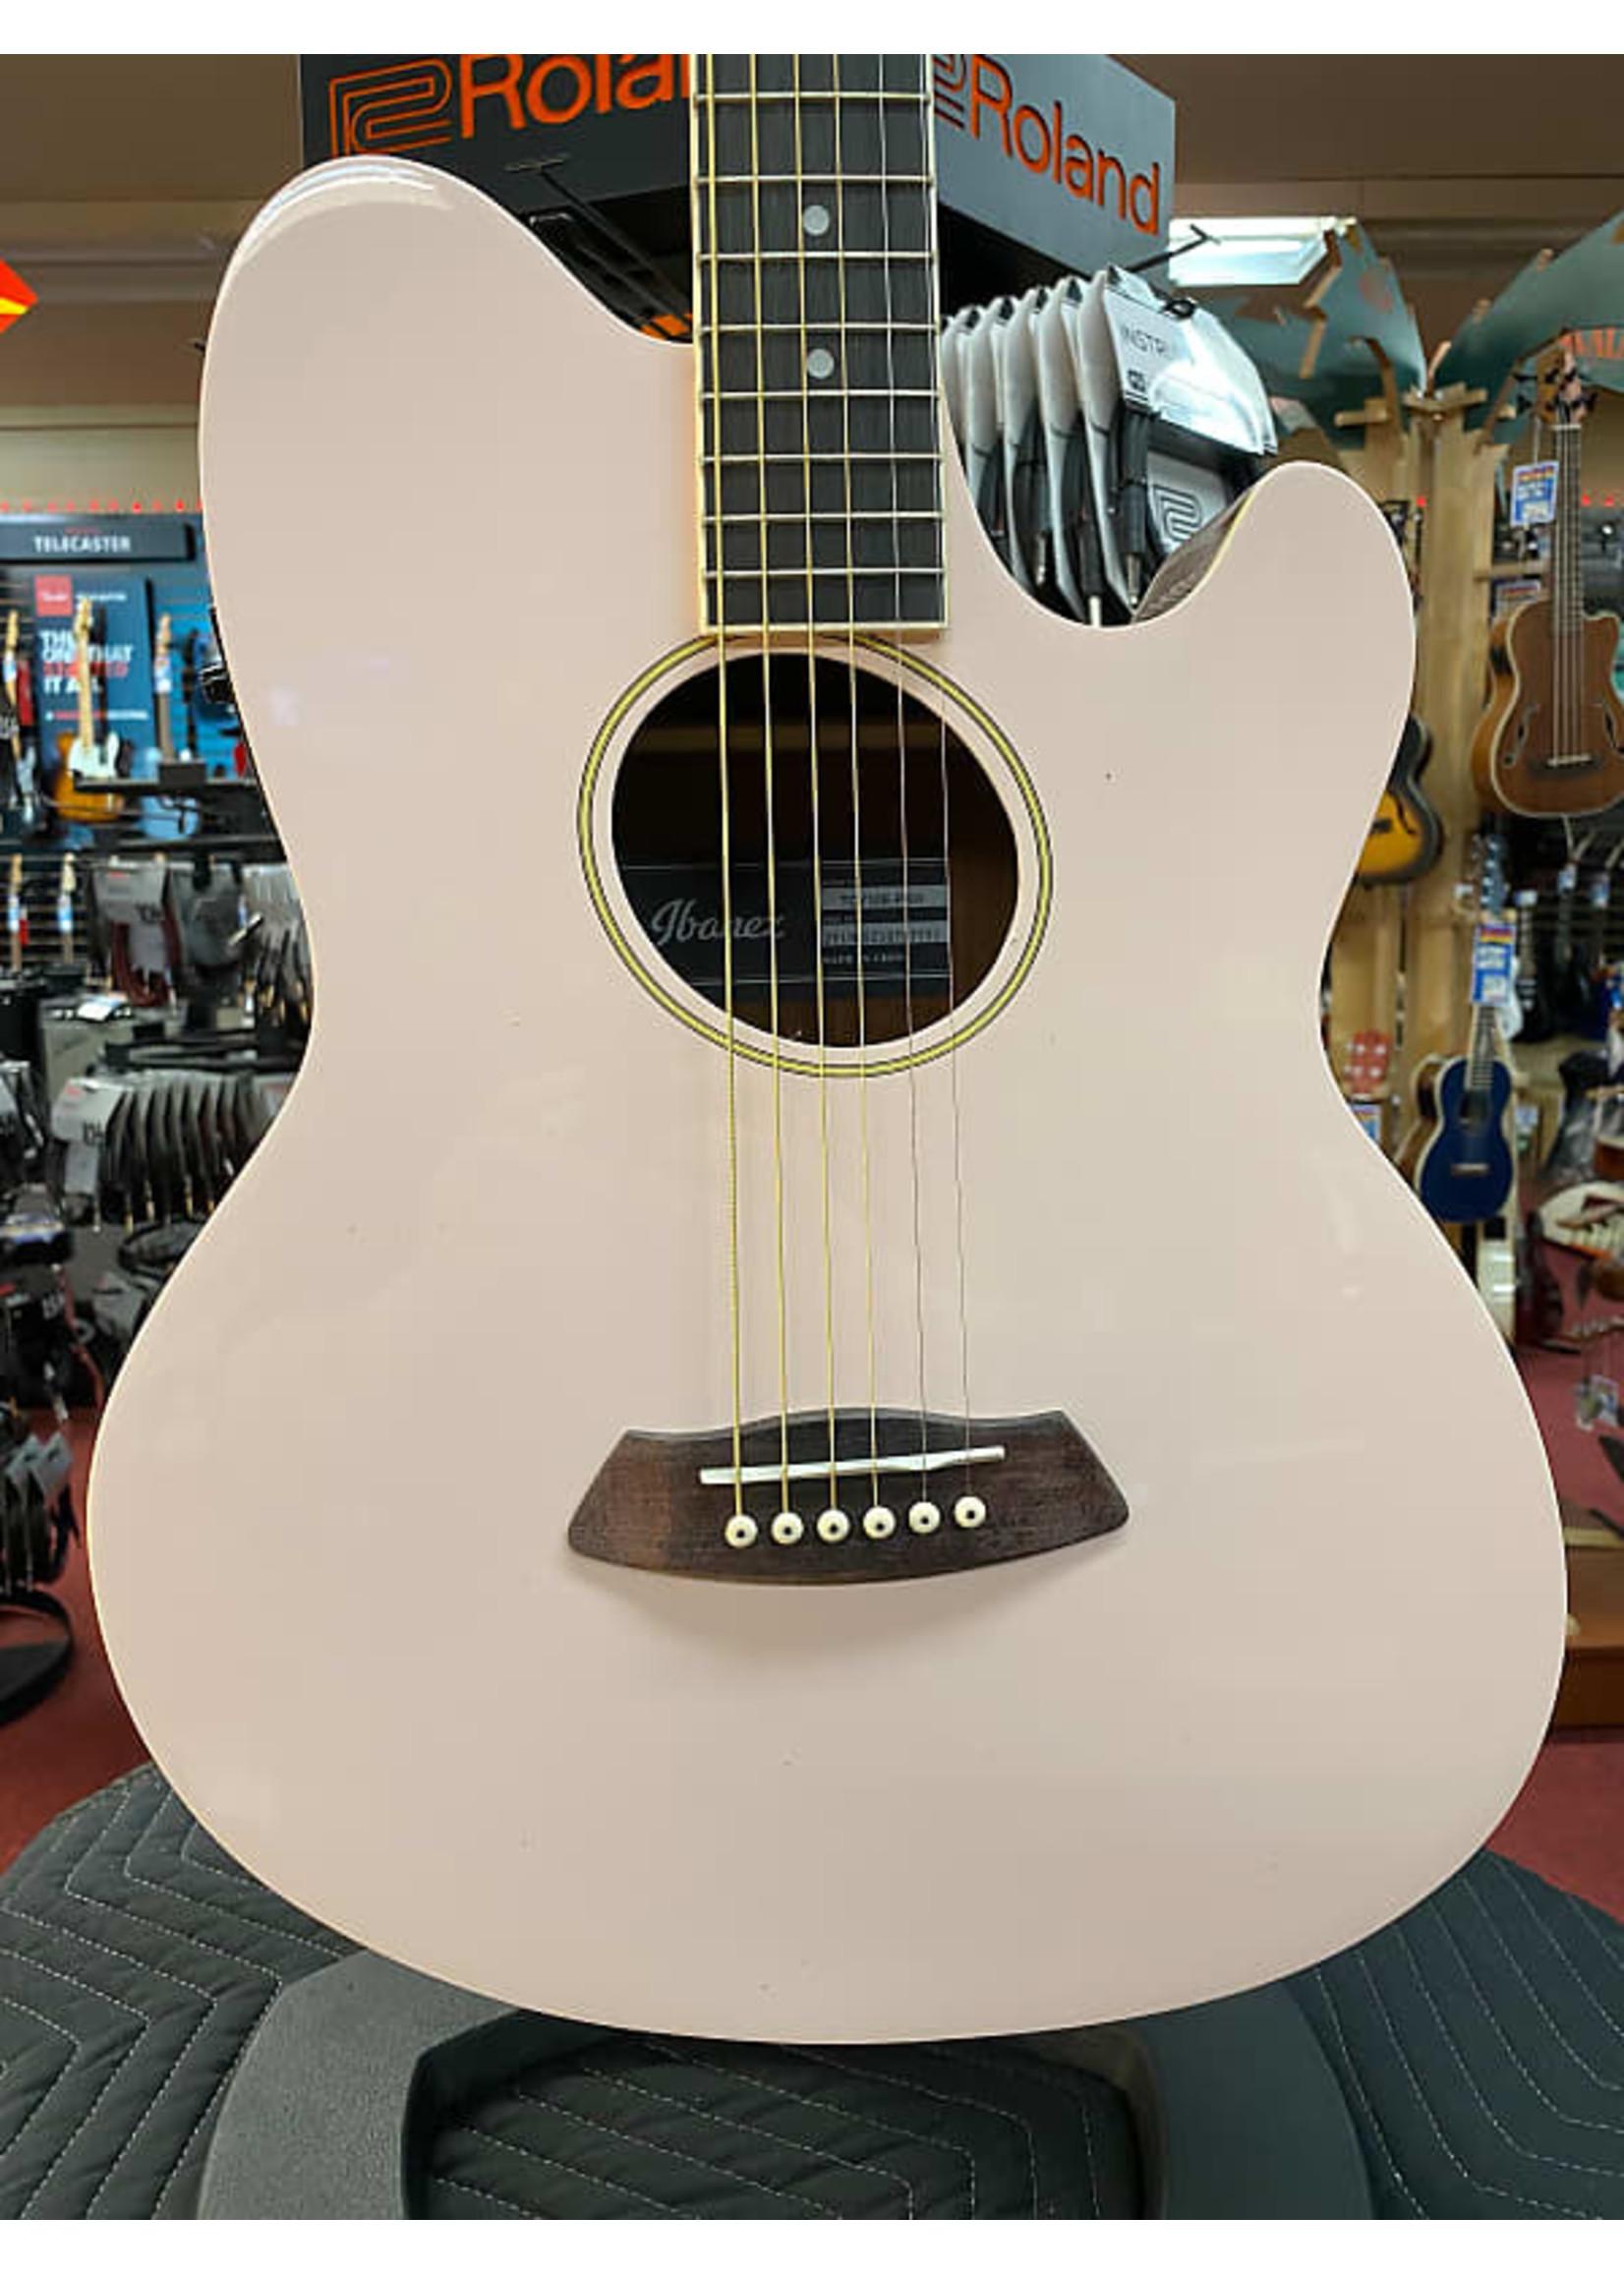 Ibanez Ibanez Talman TCY10E Acoustic-electric Guitar - Pastel Pink